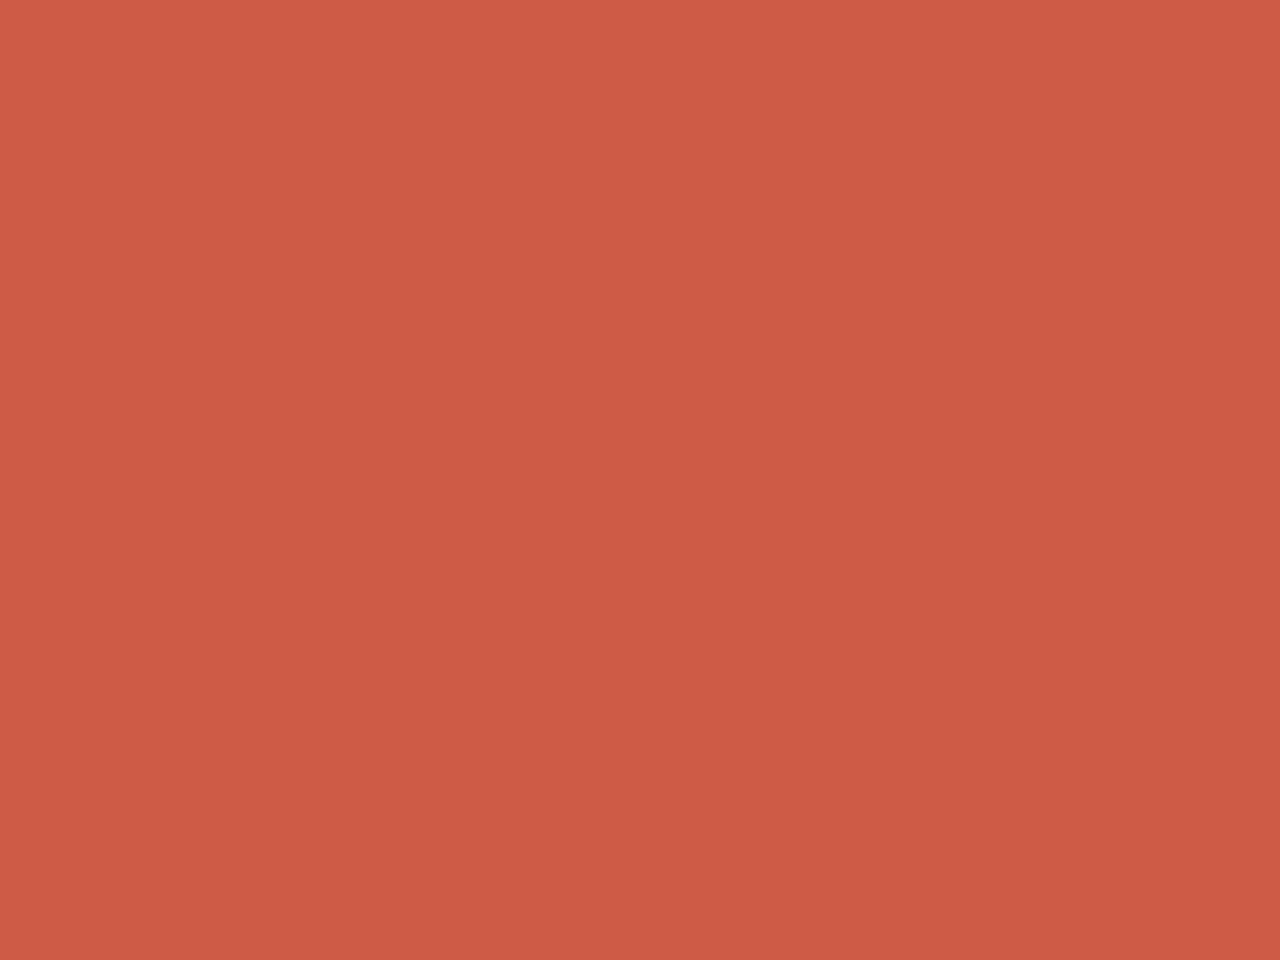 1280x960 Dark Coral Solid Color Background